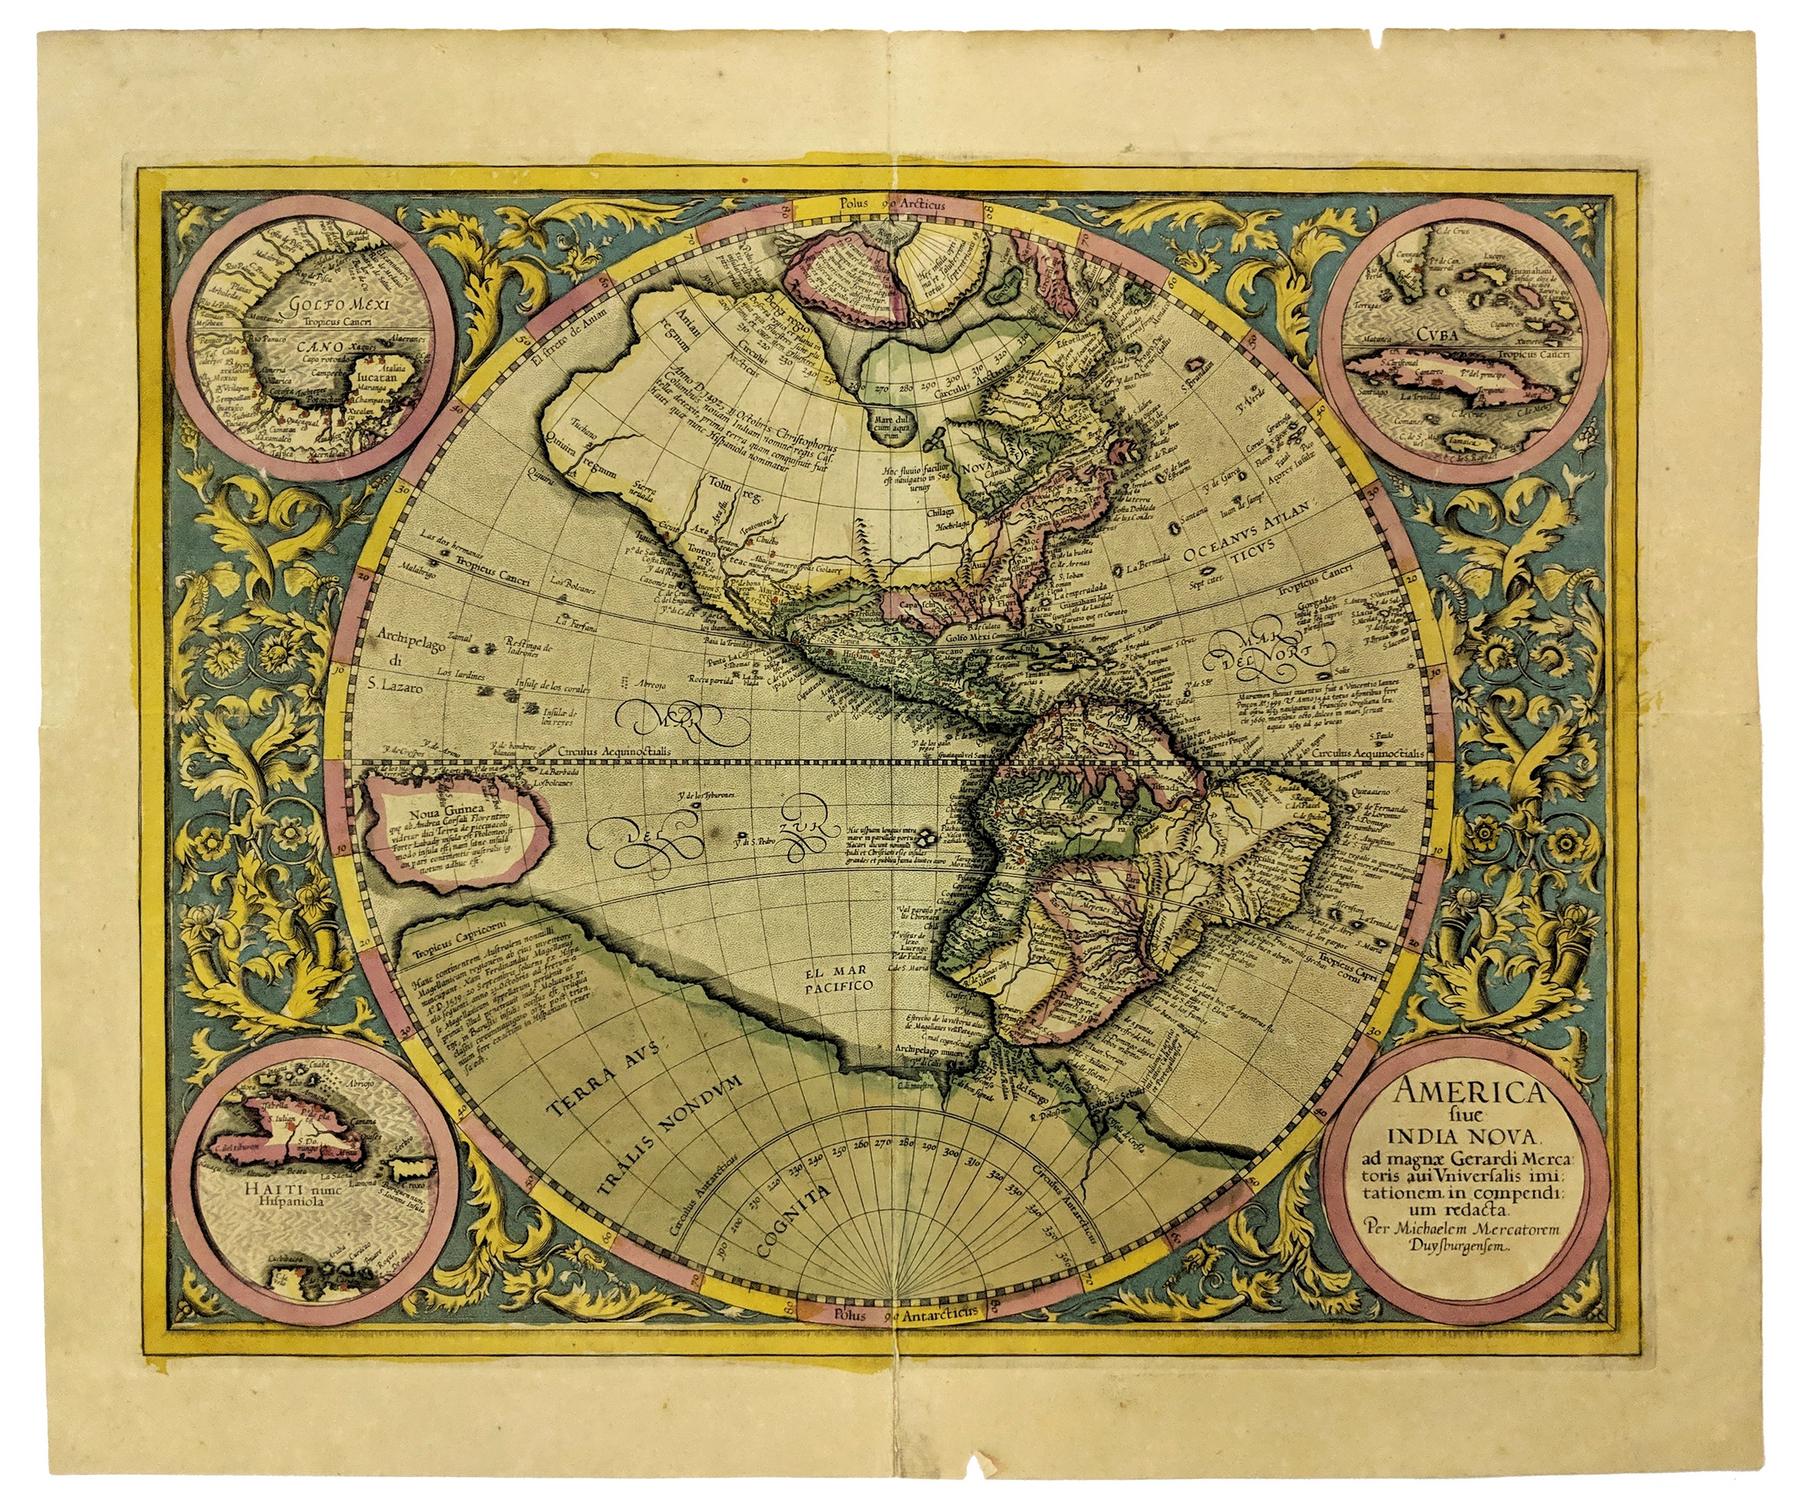 C 1615 New World Map After Mercator By Hondius America Fiue India Nova Ad Magnae Gerardi Merca New World Map Map Vintage World Maps